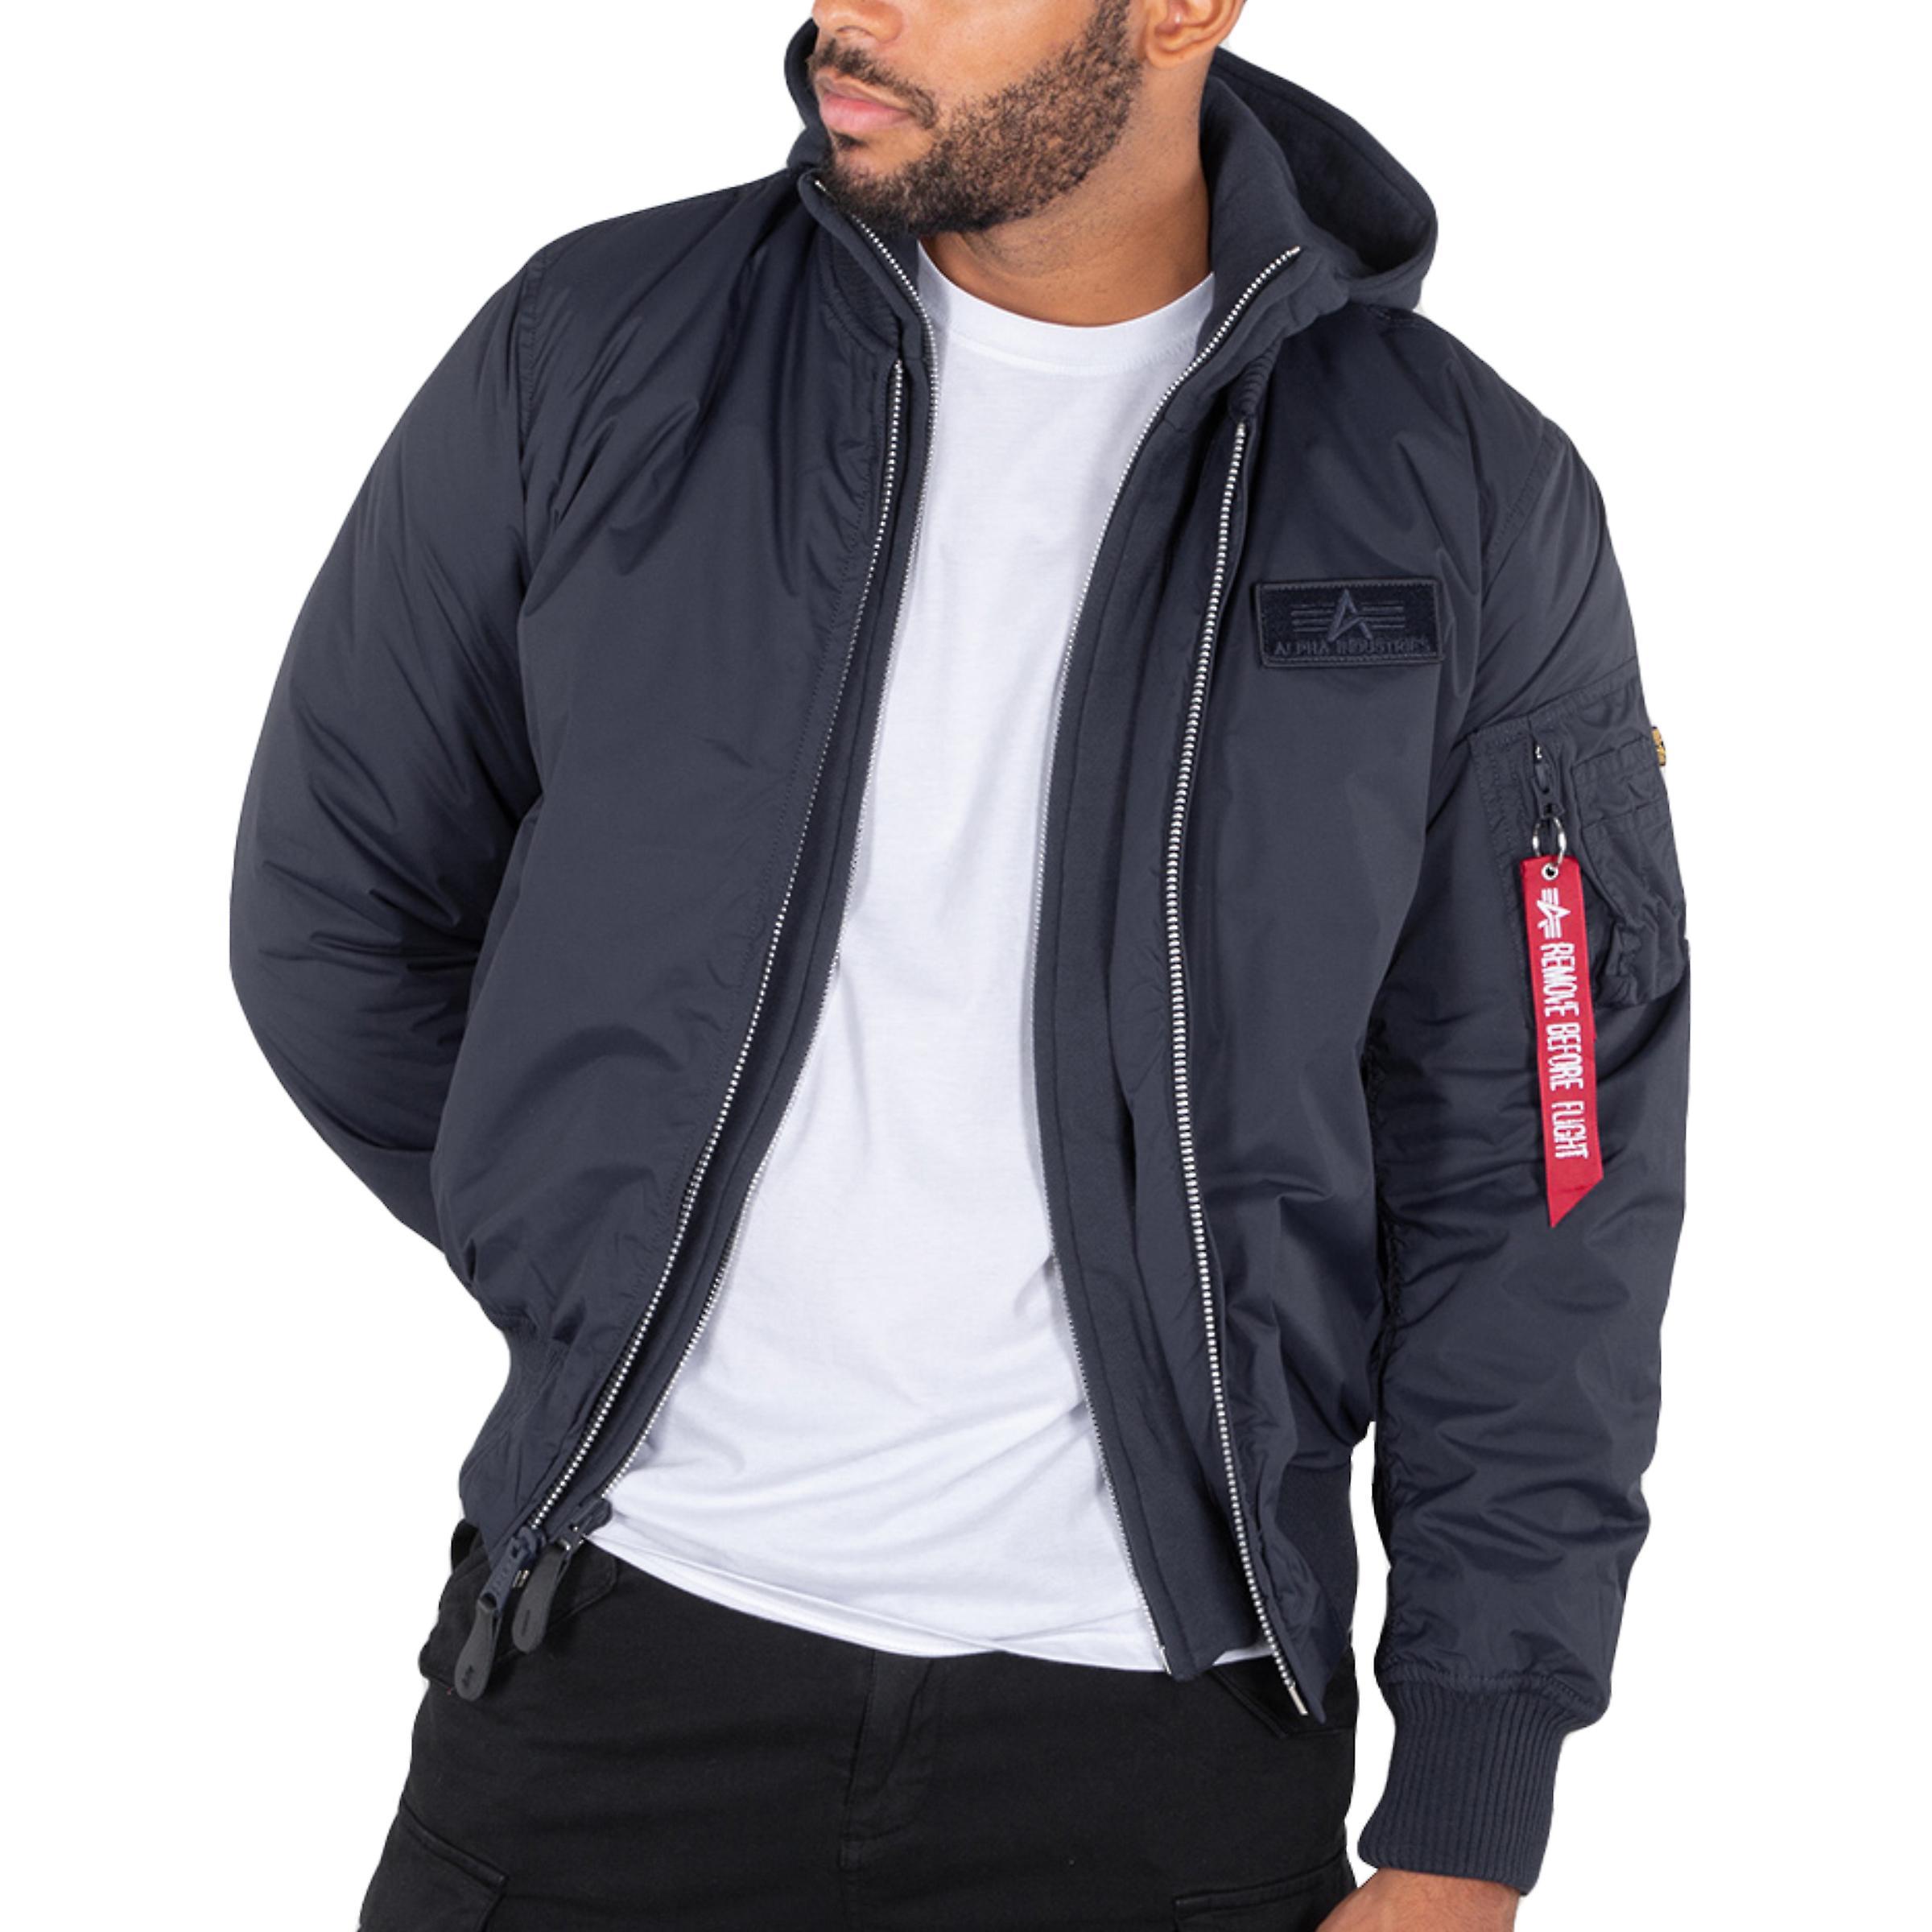 Alpha Industries MA 1 D Tec Jacket (Herr) Hitta bästa pris